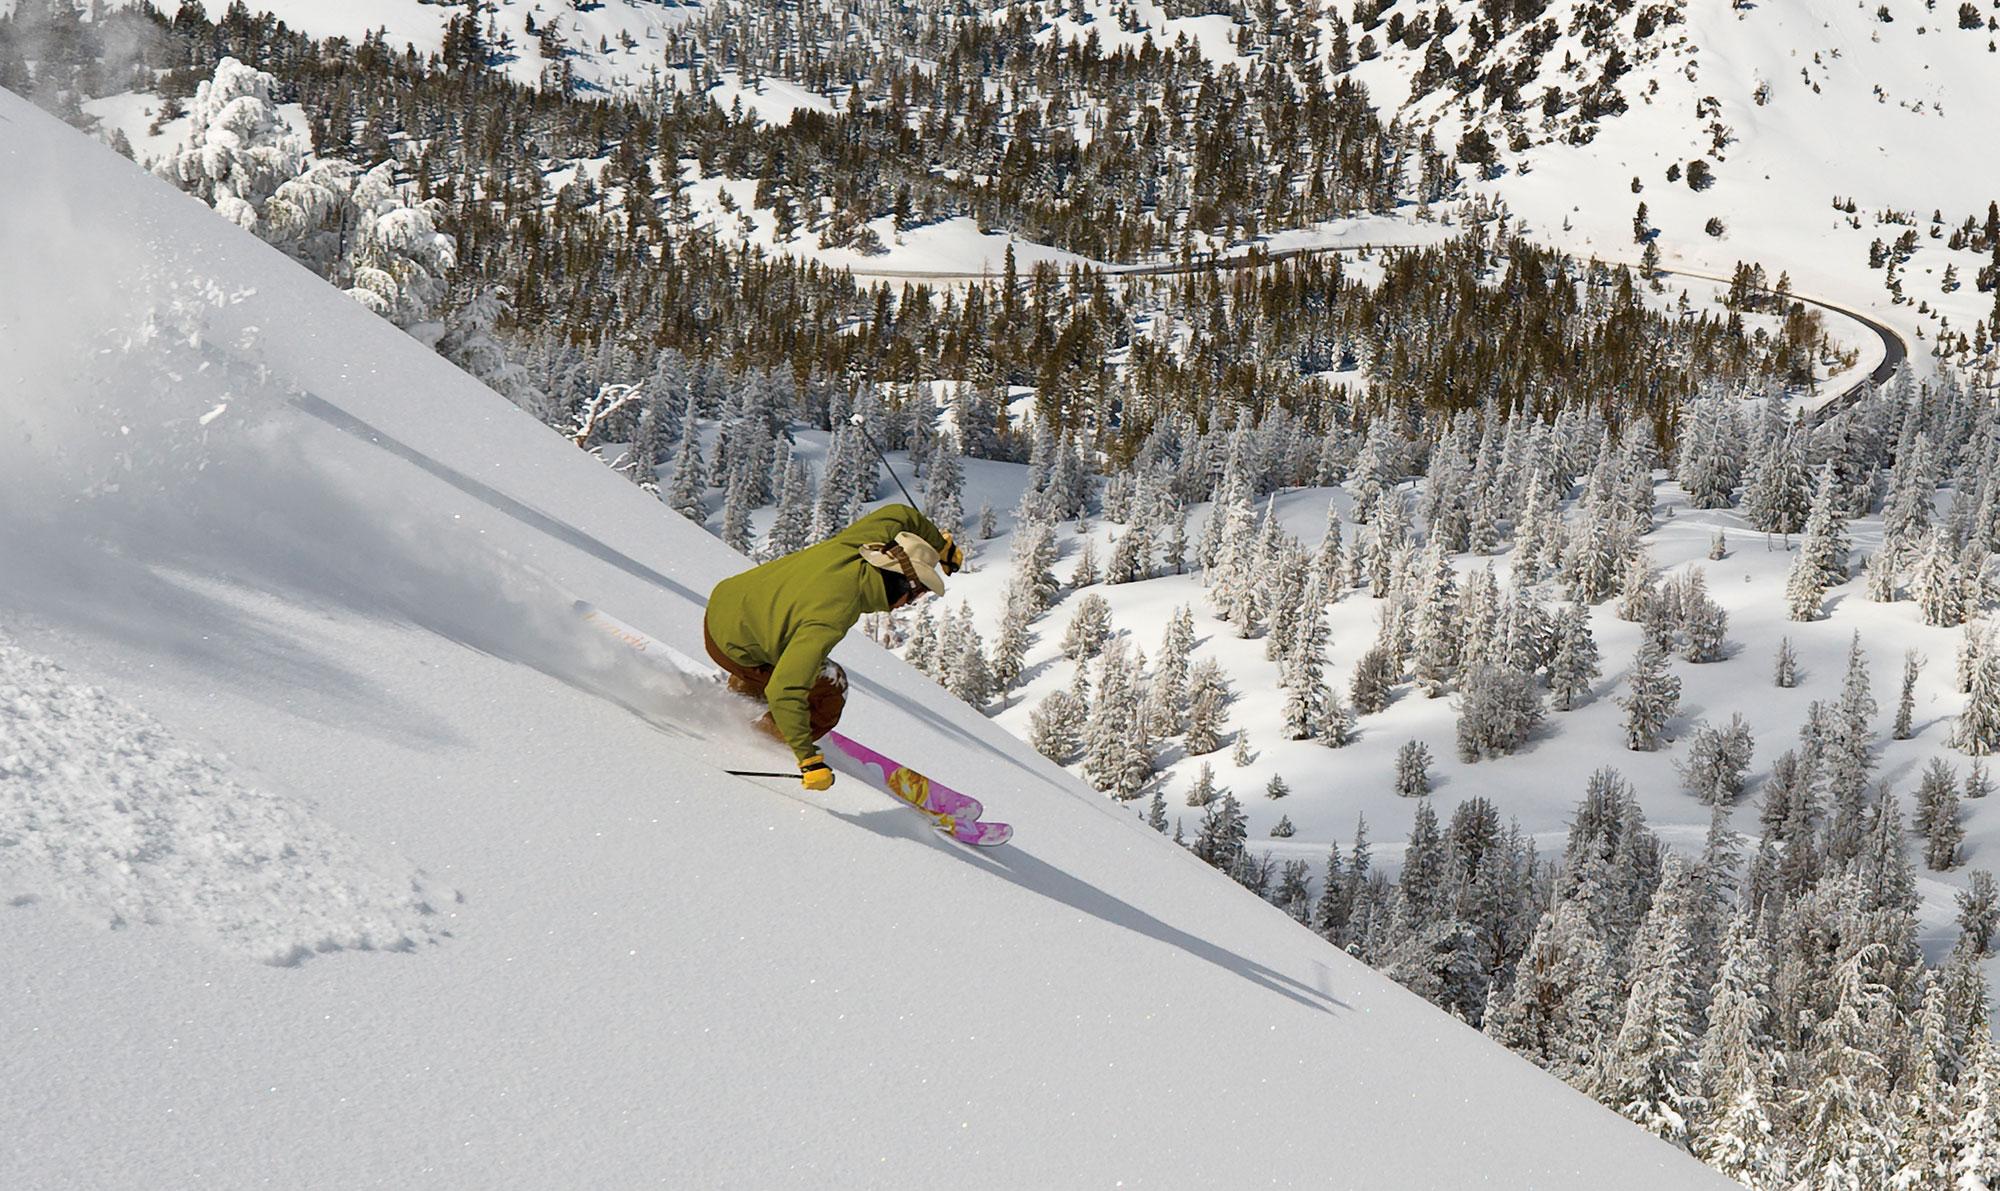 top three tahoe ski resorts near parc forêt - parc forêt at montrêux